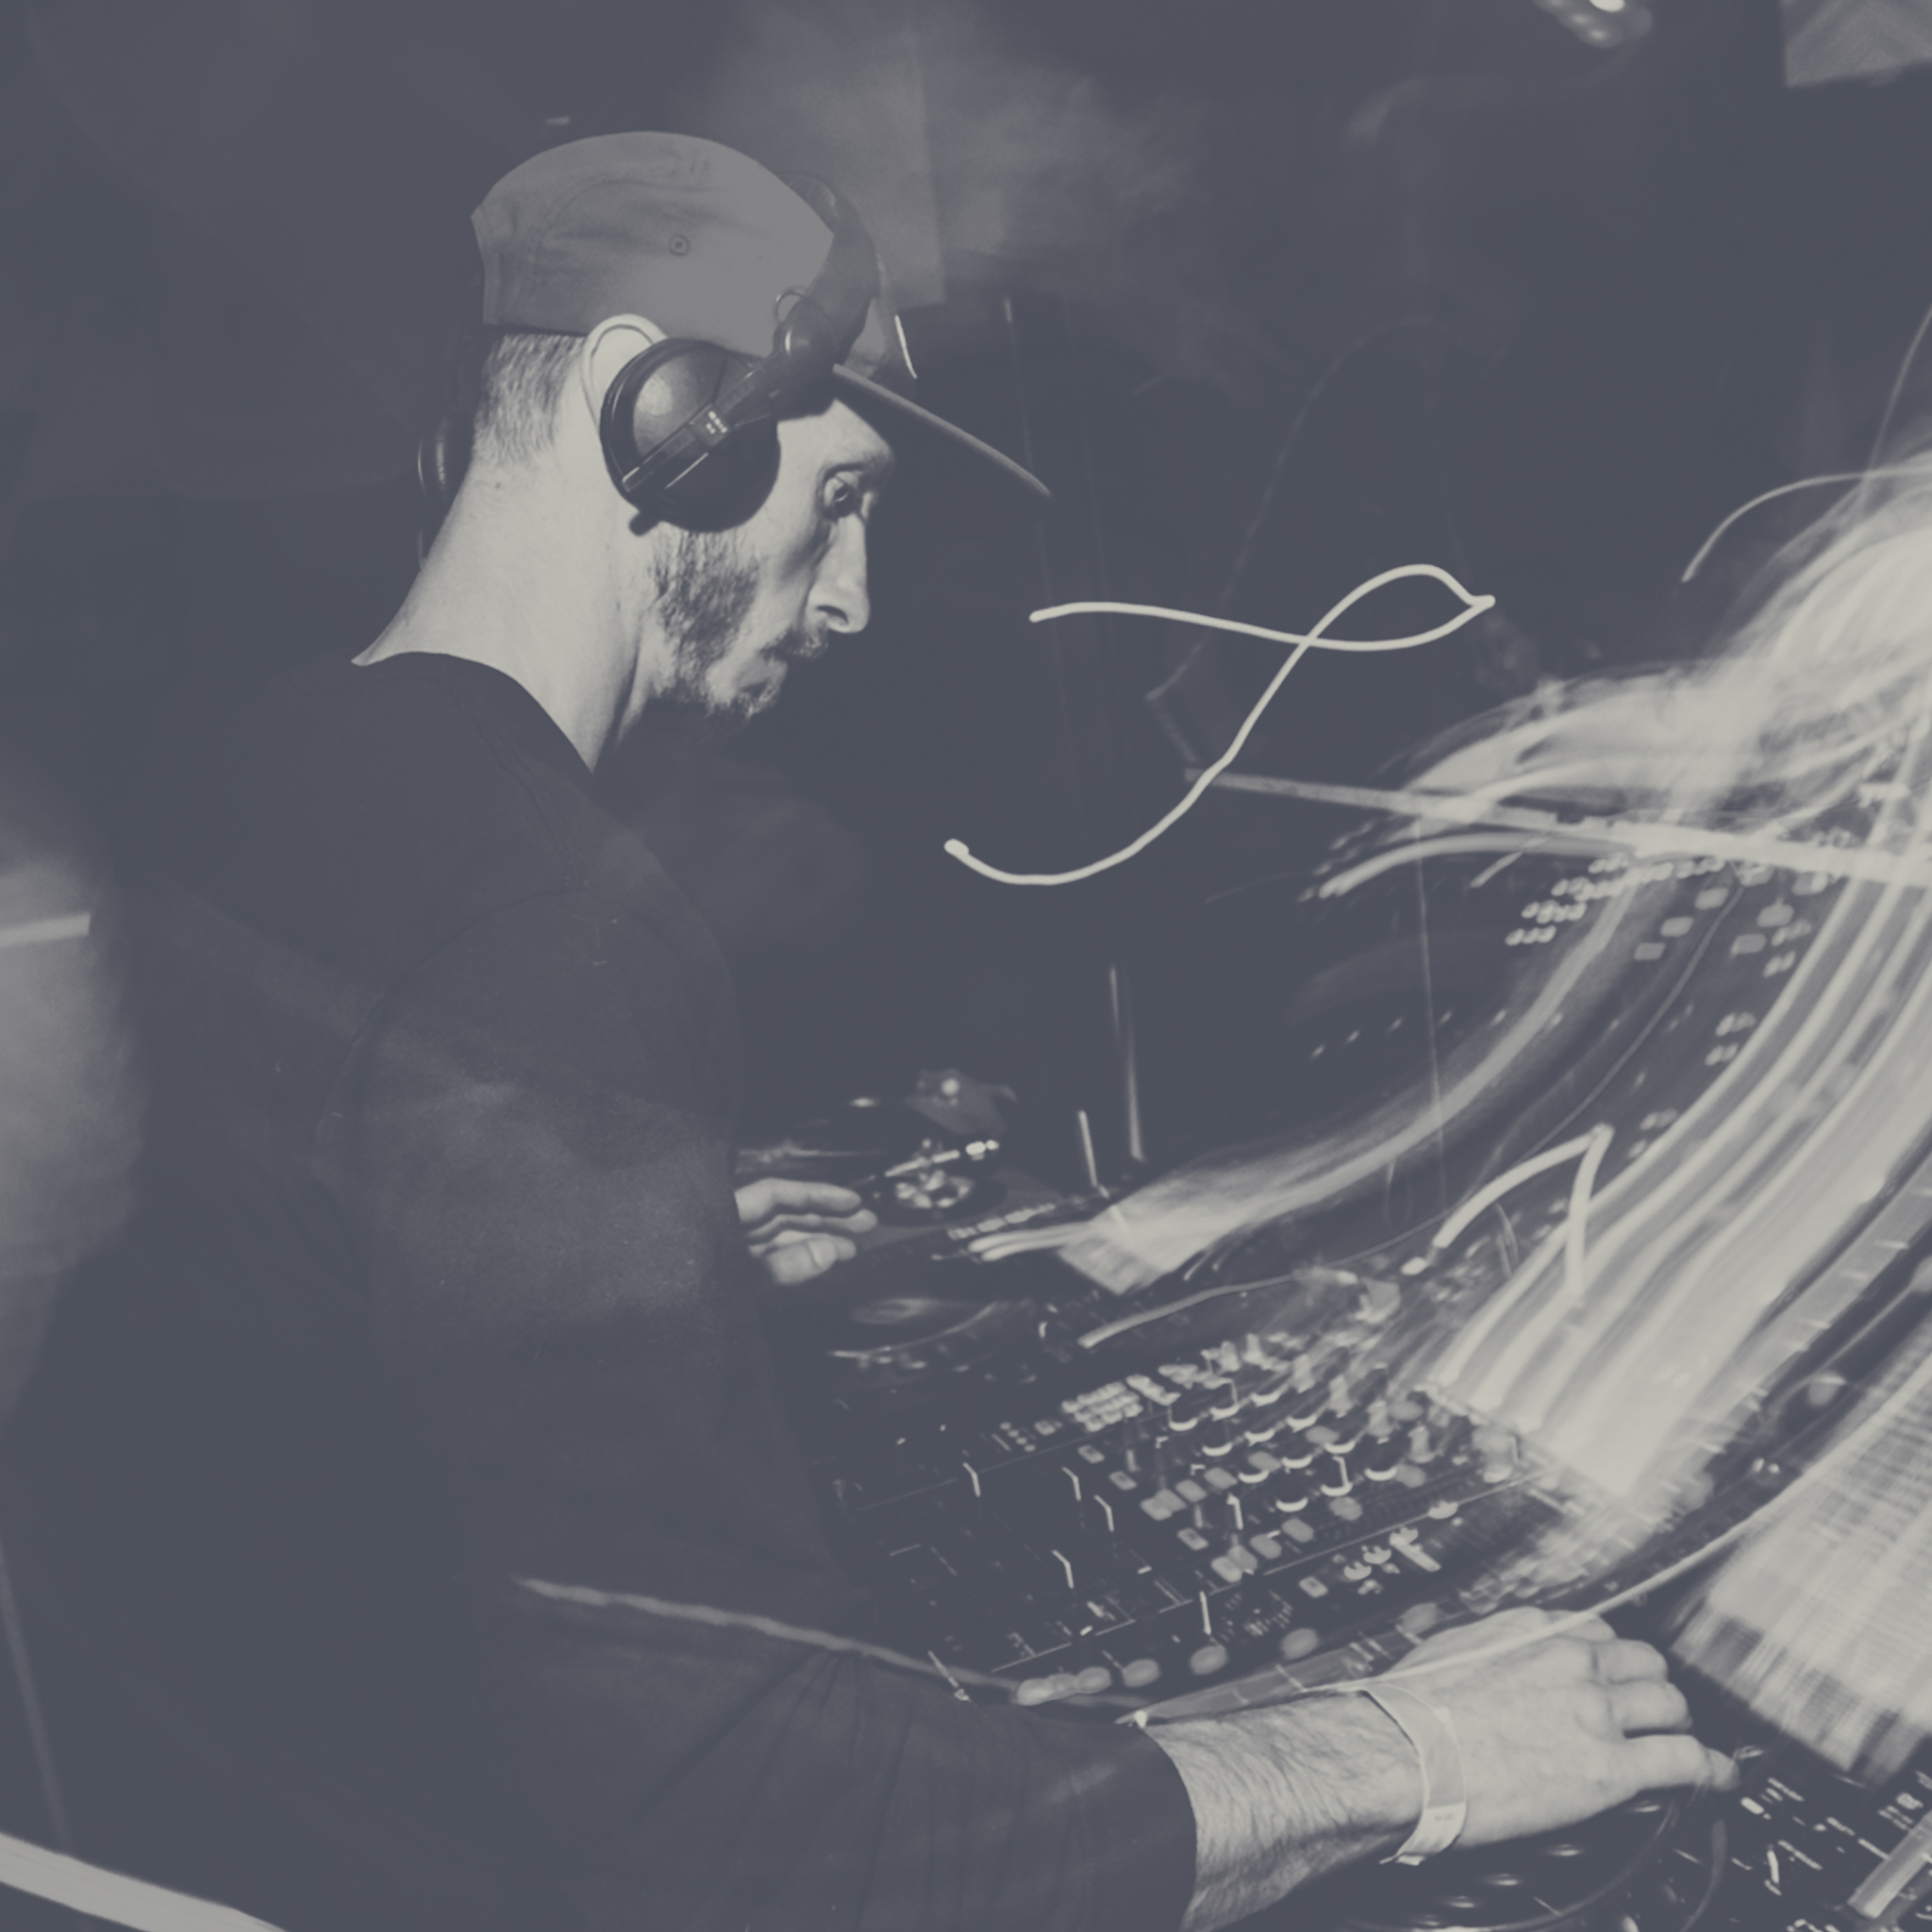 Matthew Fit - DJ, NCM Partner